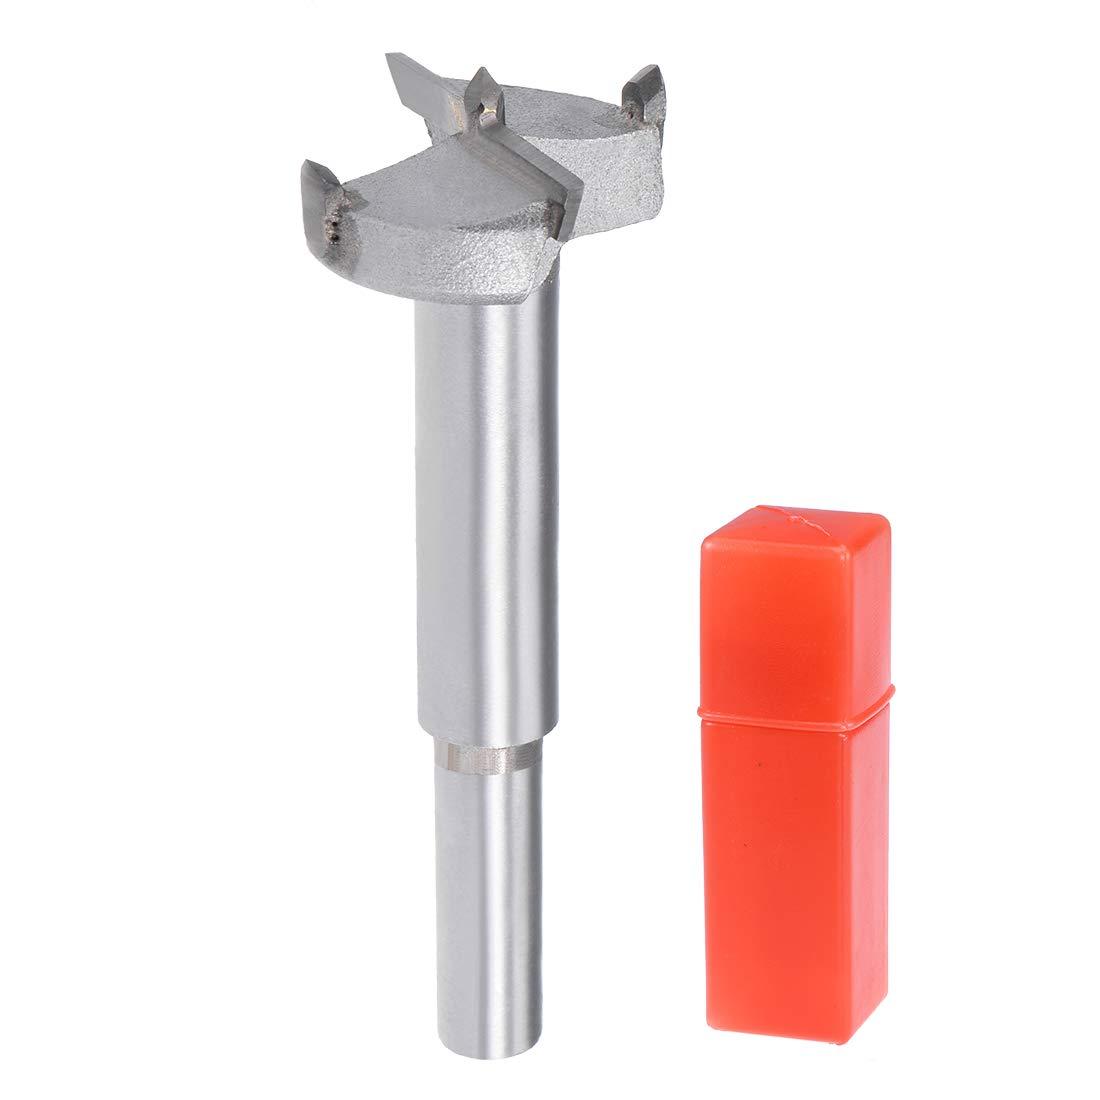 18mm Diameter 7mm Shank uxcell Hinge Boring Forstner Drill Bit